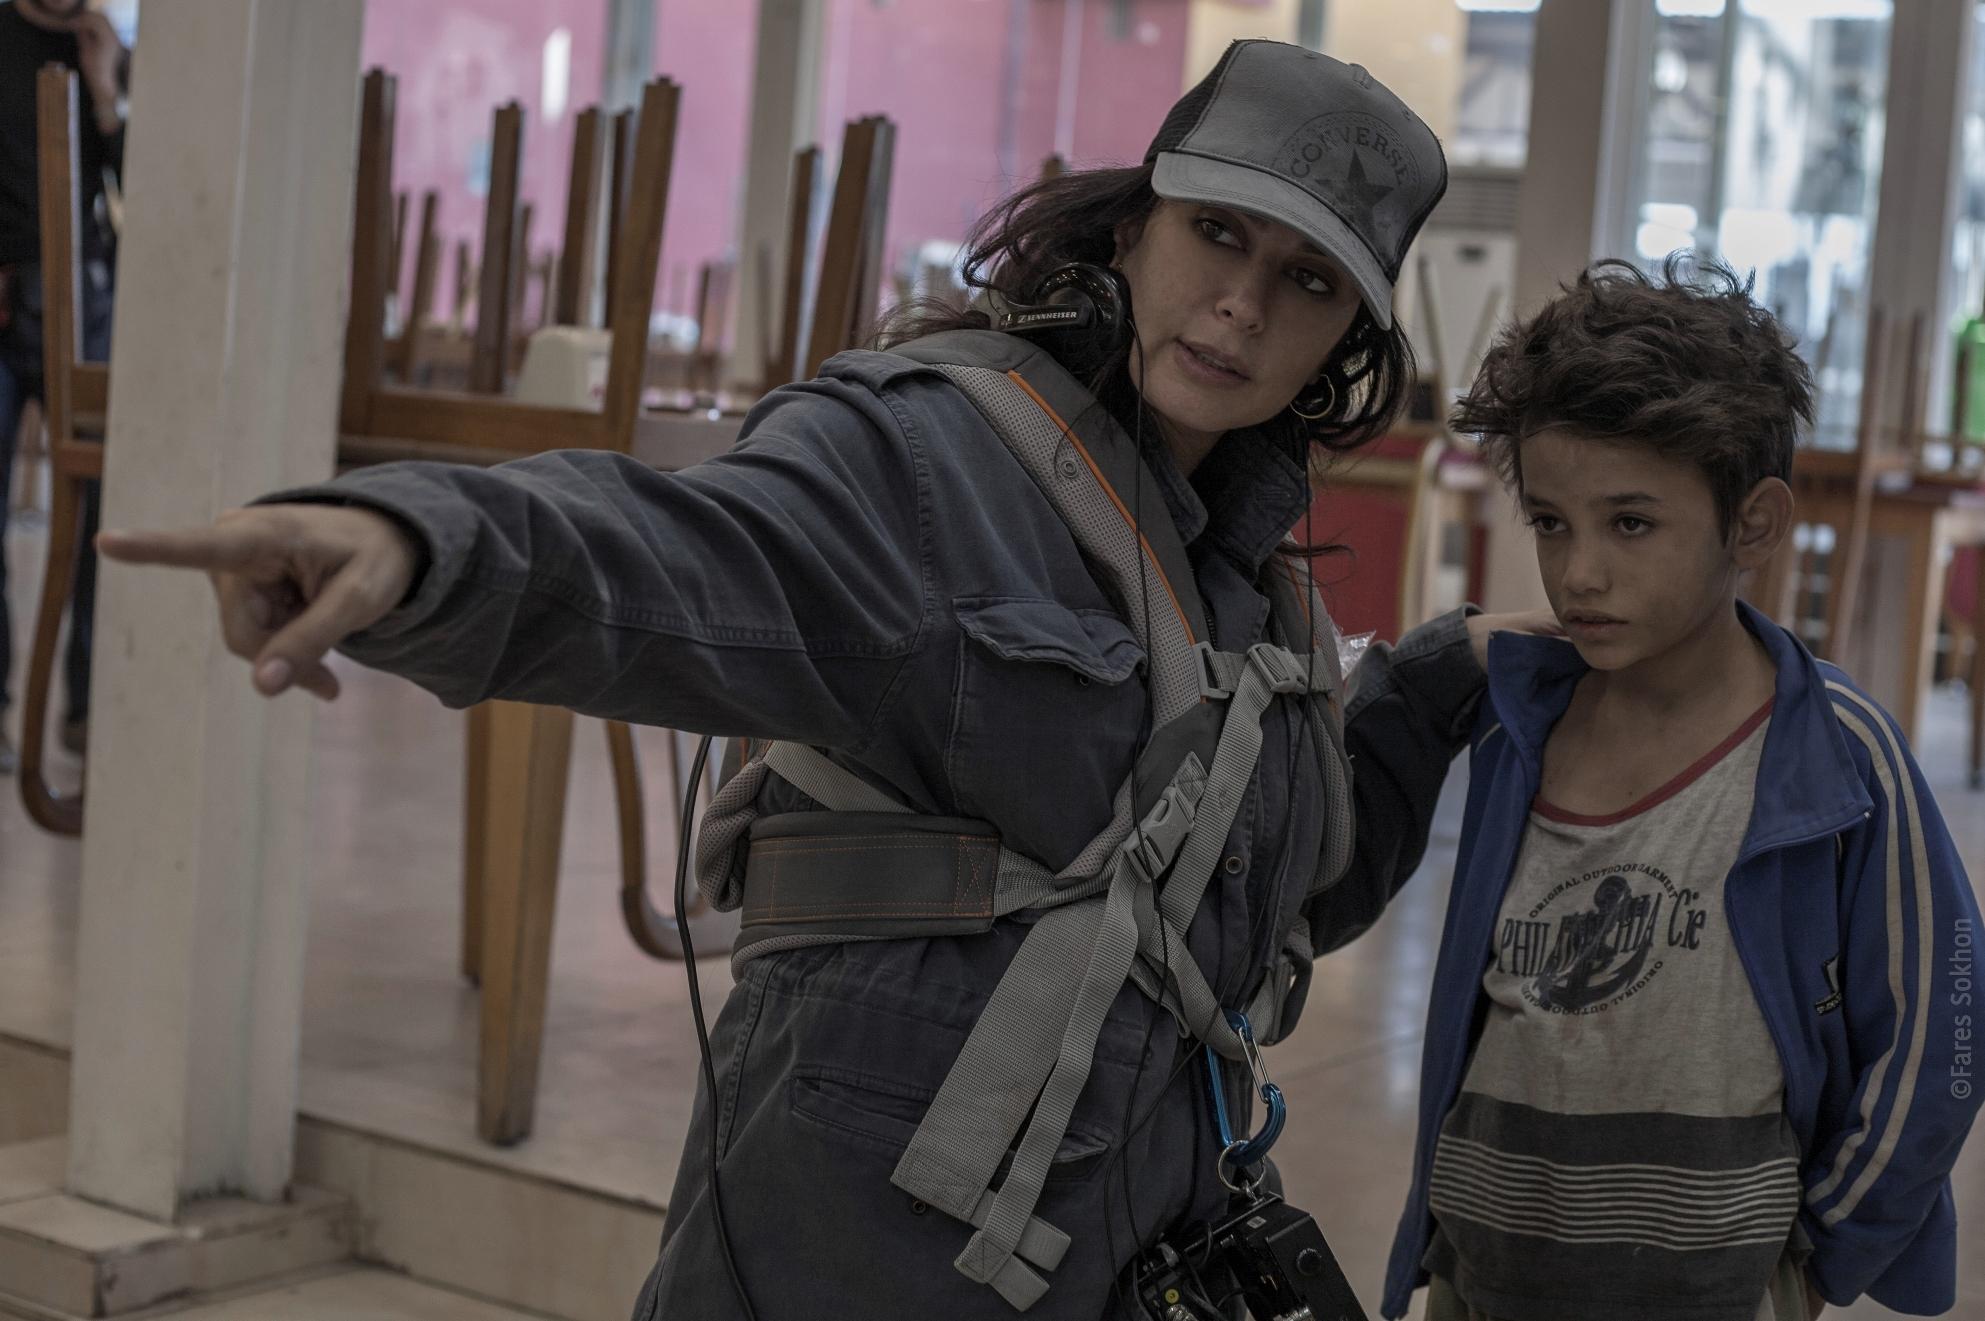 Cafarnao - Caos e miracoli: Zain Al Rafeea e Nadine Labaki sul set